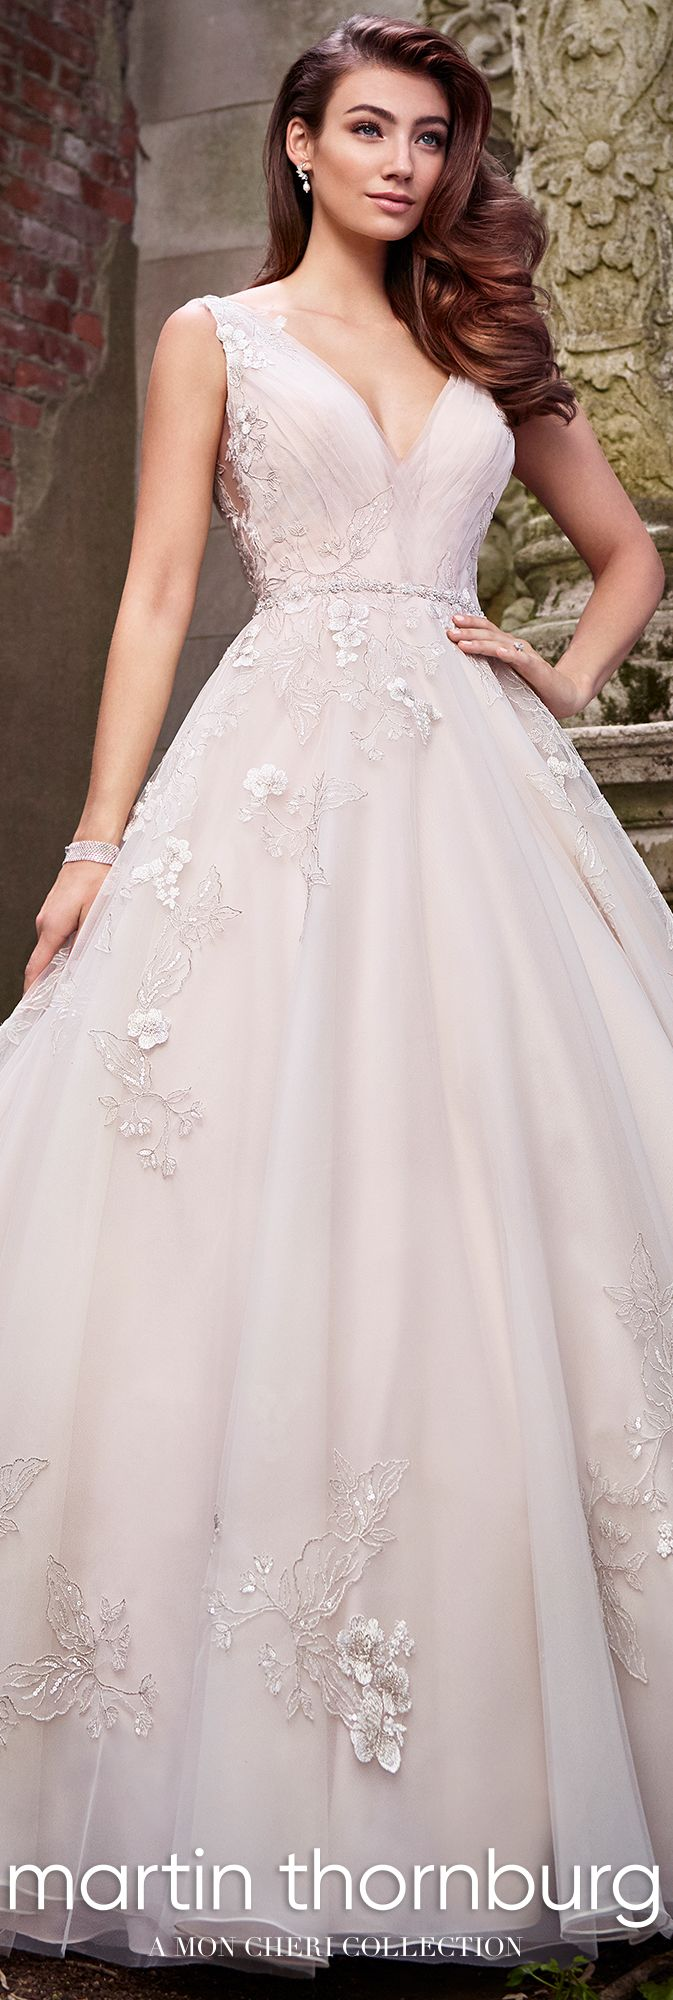 Martin Thornburg Brianna Martin Thornburg Wedding Dresses Mon Cheri Long Sleeve Wedding Gowns Modest Wedding Gowns Princess Wedding Dresses